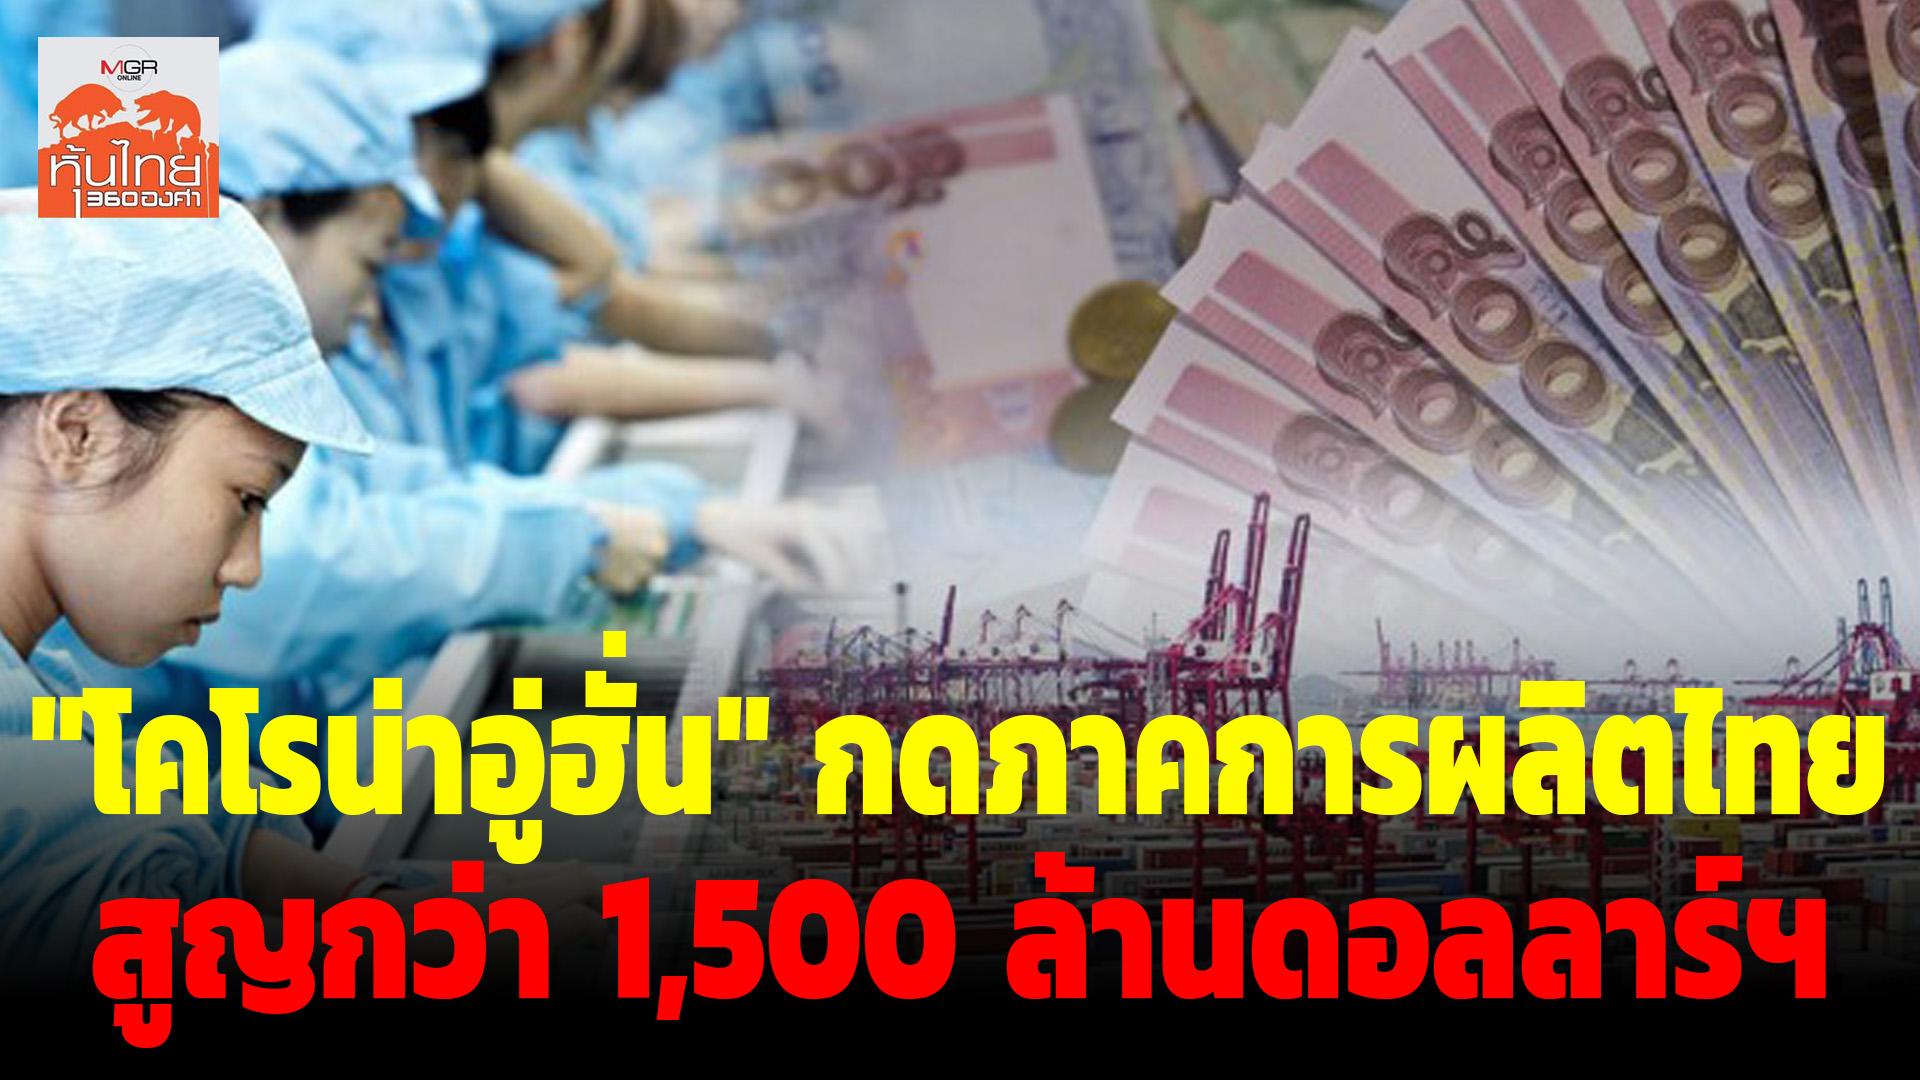 "K-Research คาด ""วิกฤตไวรัสโคโรน่าอู่ฮั่น"" กระทบภาคการผลิตไทยสูญกว่า 1,500 ล้านดอลลาร์ฯ"